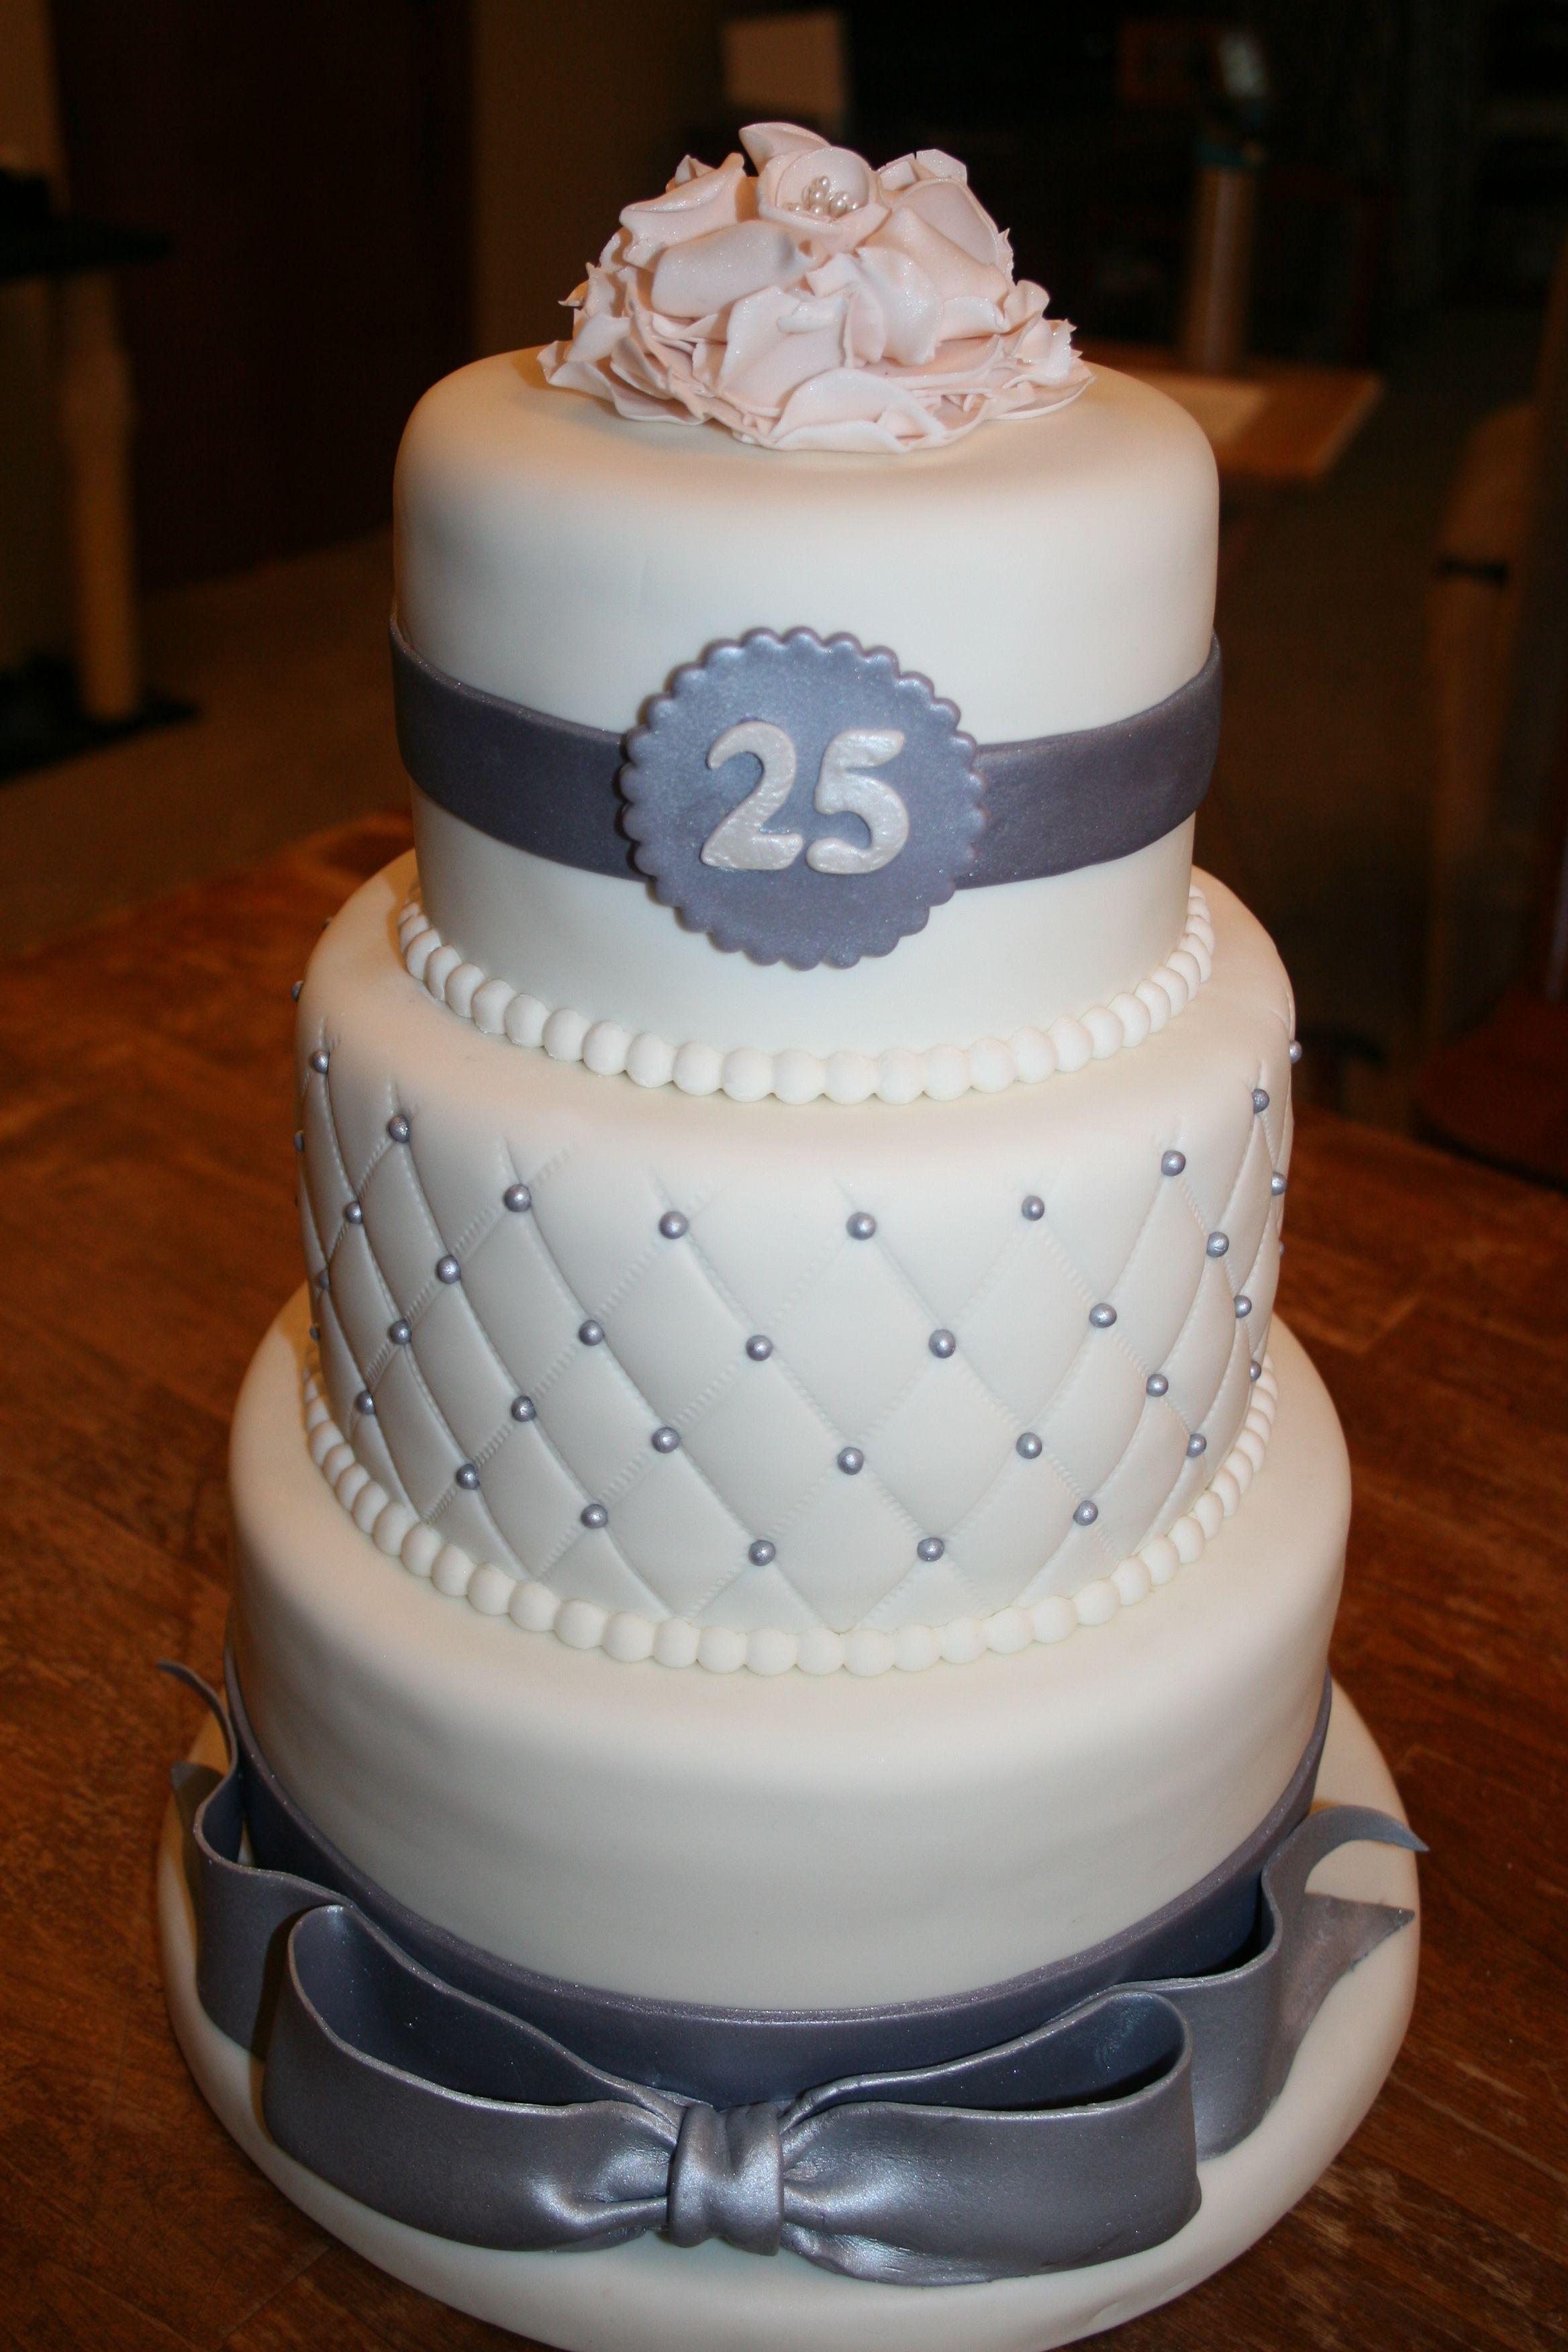 25th Anniversary Cake | Anniversary cake, 25 anniversary ...